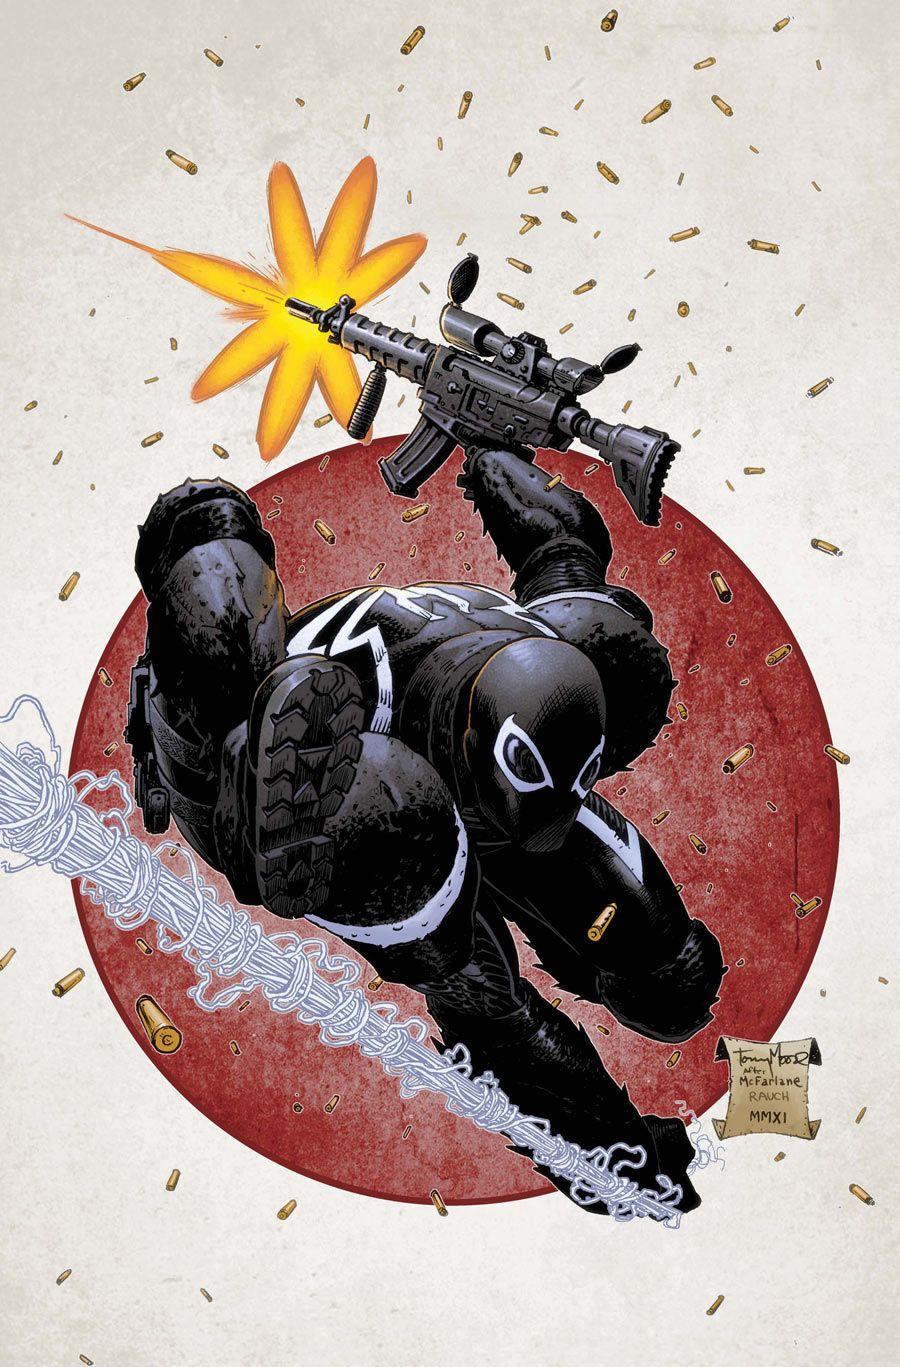 Venom Vol 2 #2 Cover Artists Tony Moore and John Rauch